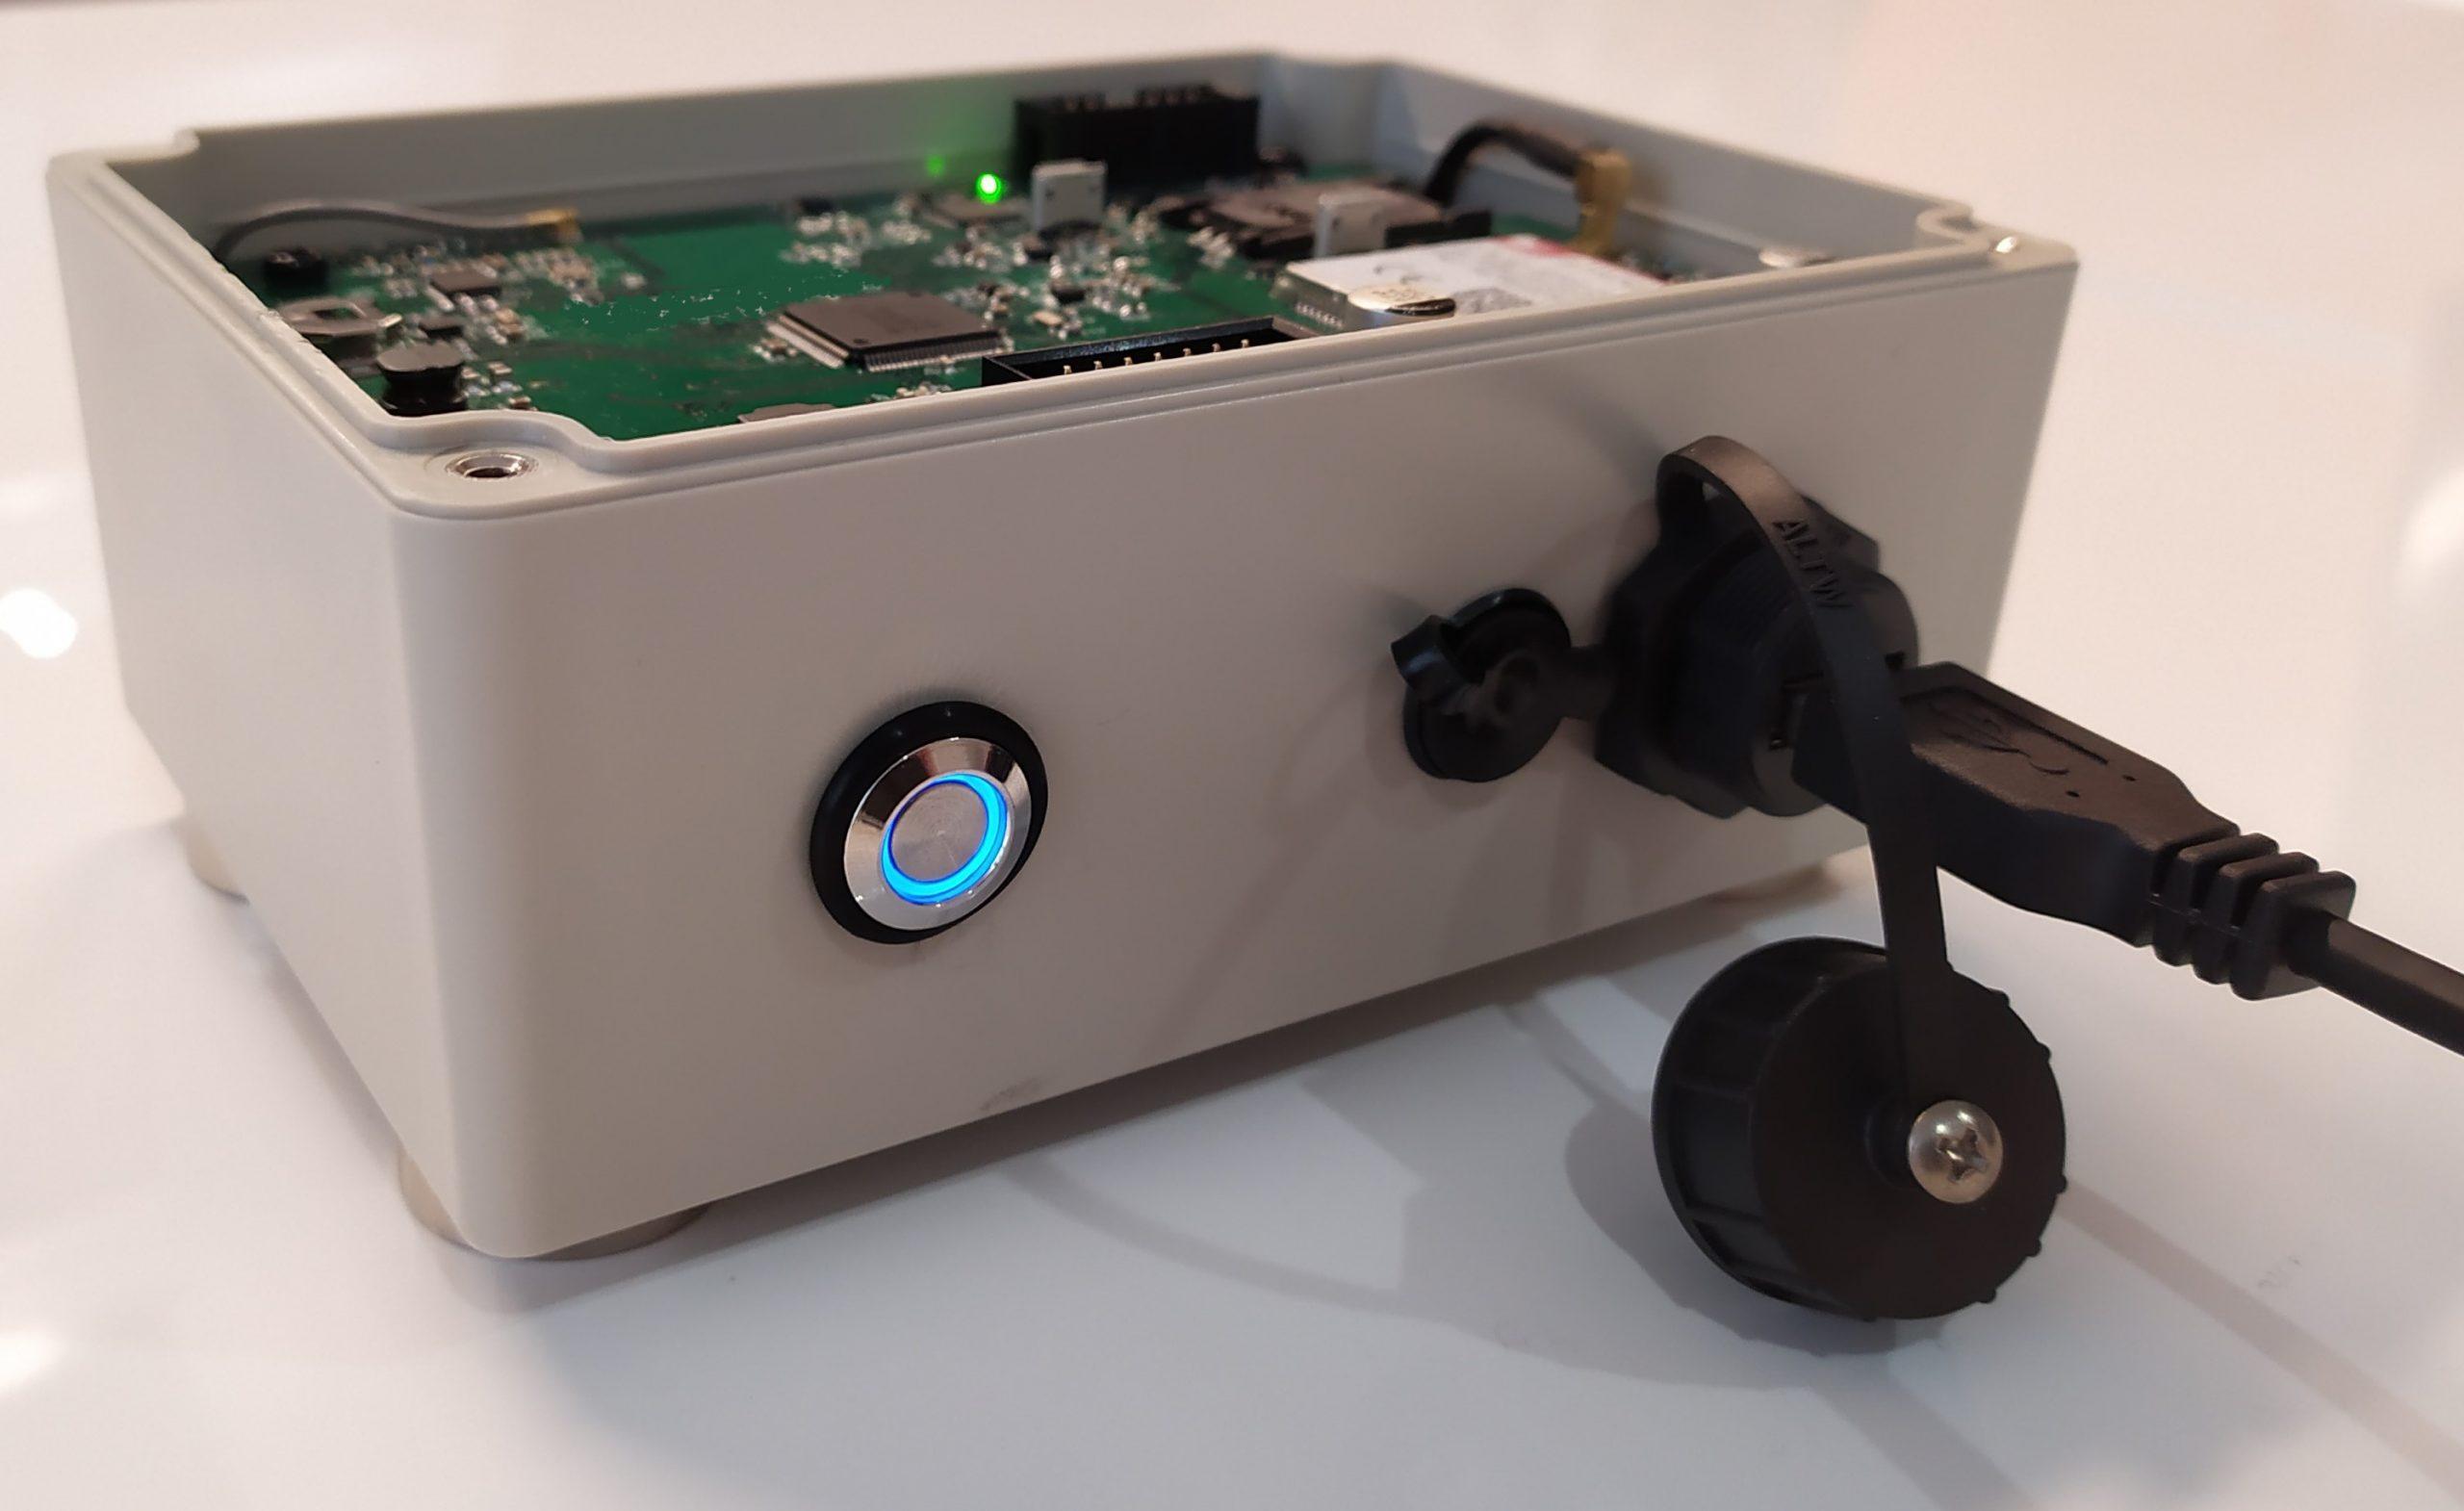 https://www.advanticsys.com/wp-content/uploads/2020/11/Construction-Machinery-IoT-box-scaled.jpg